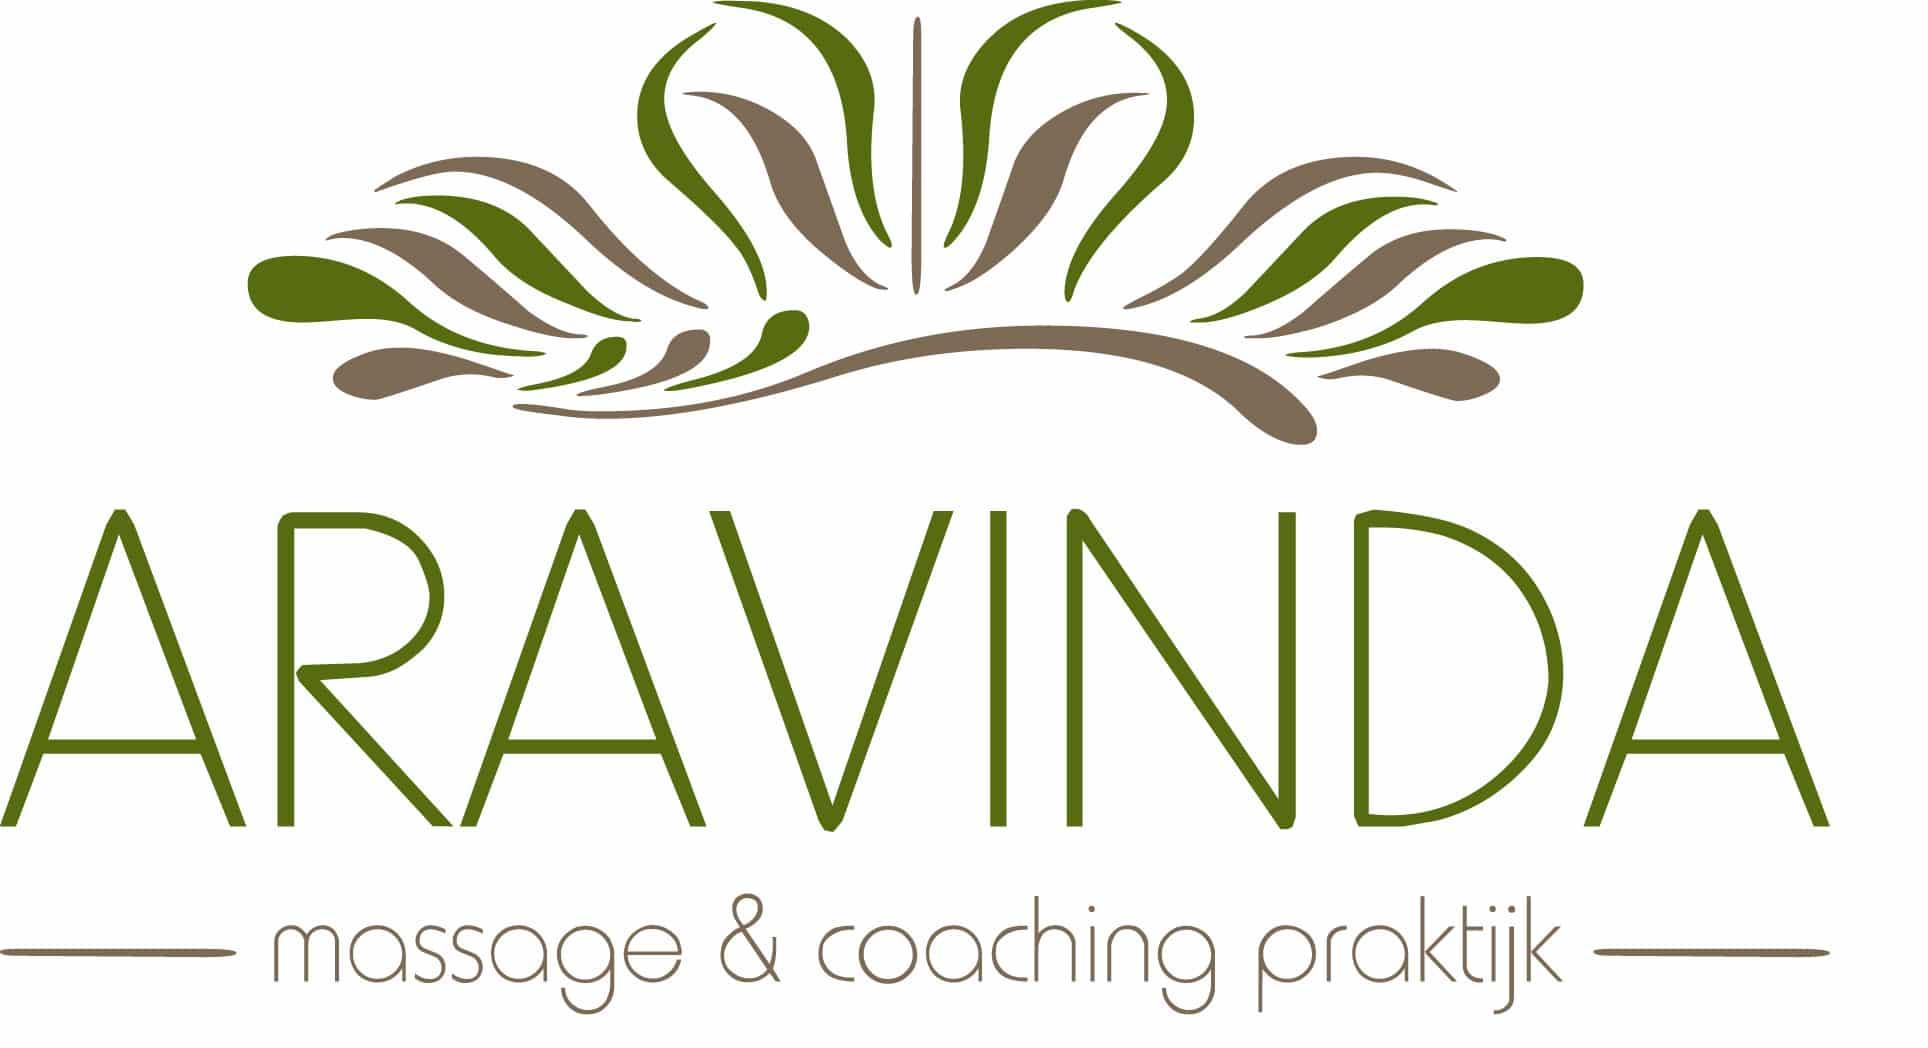 Aravinda Massage groepspraktijk